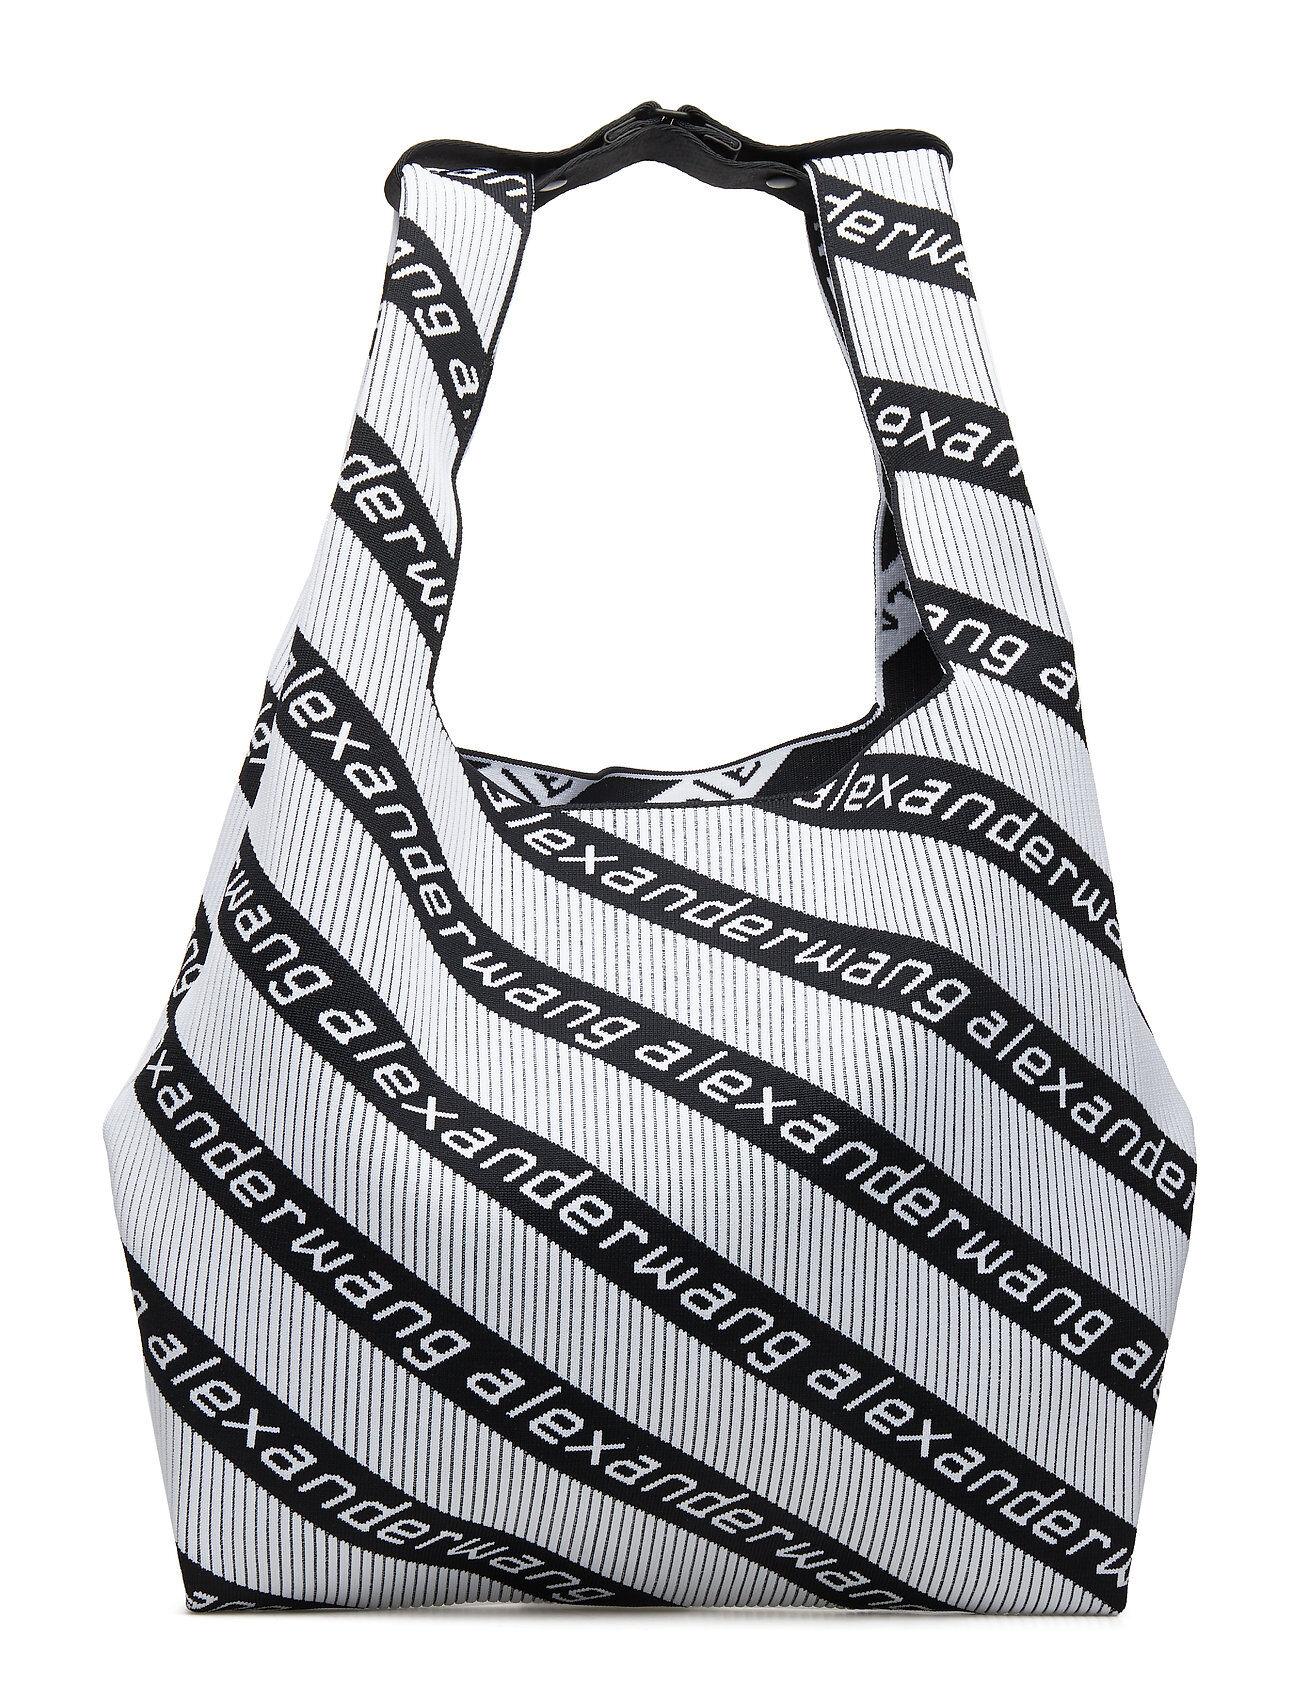 Alexander Wang Knit Jcqd Shopper In Wht/Blk Diagonal Logo